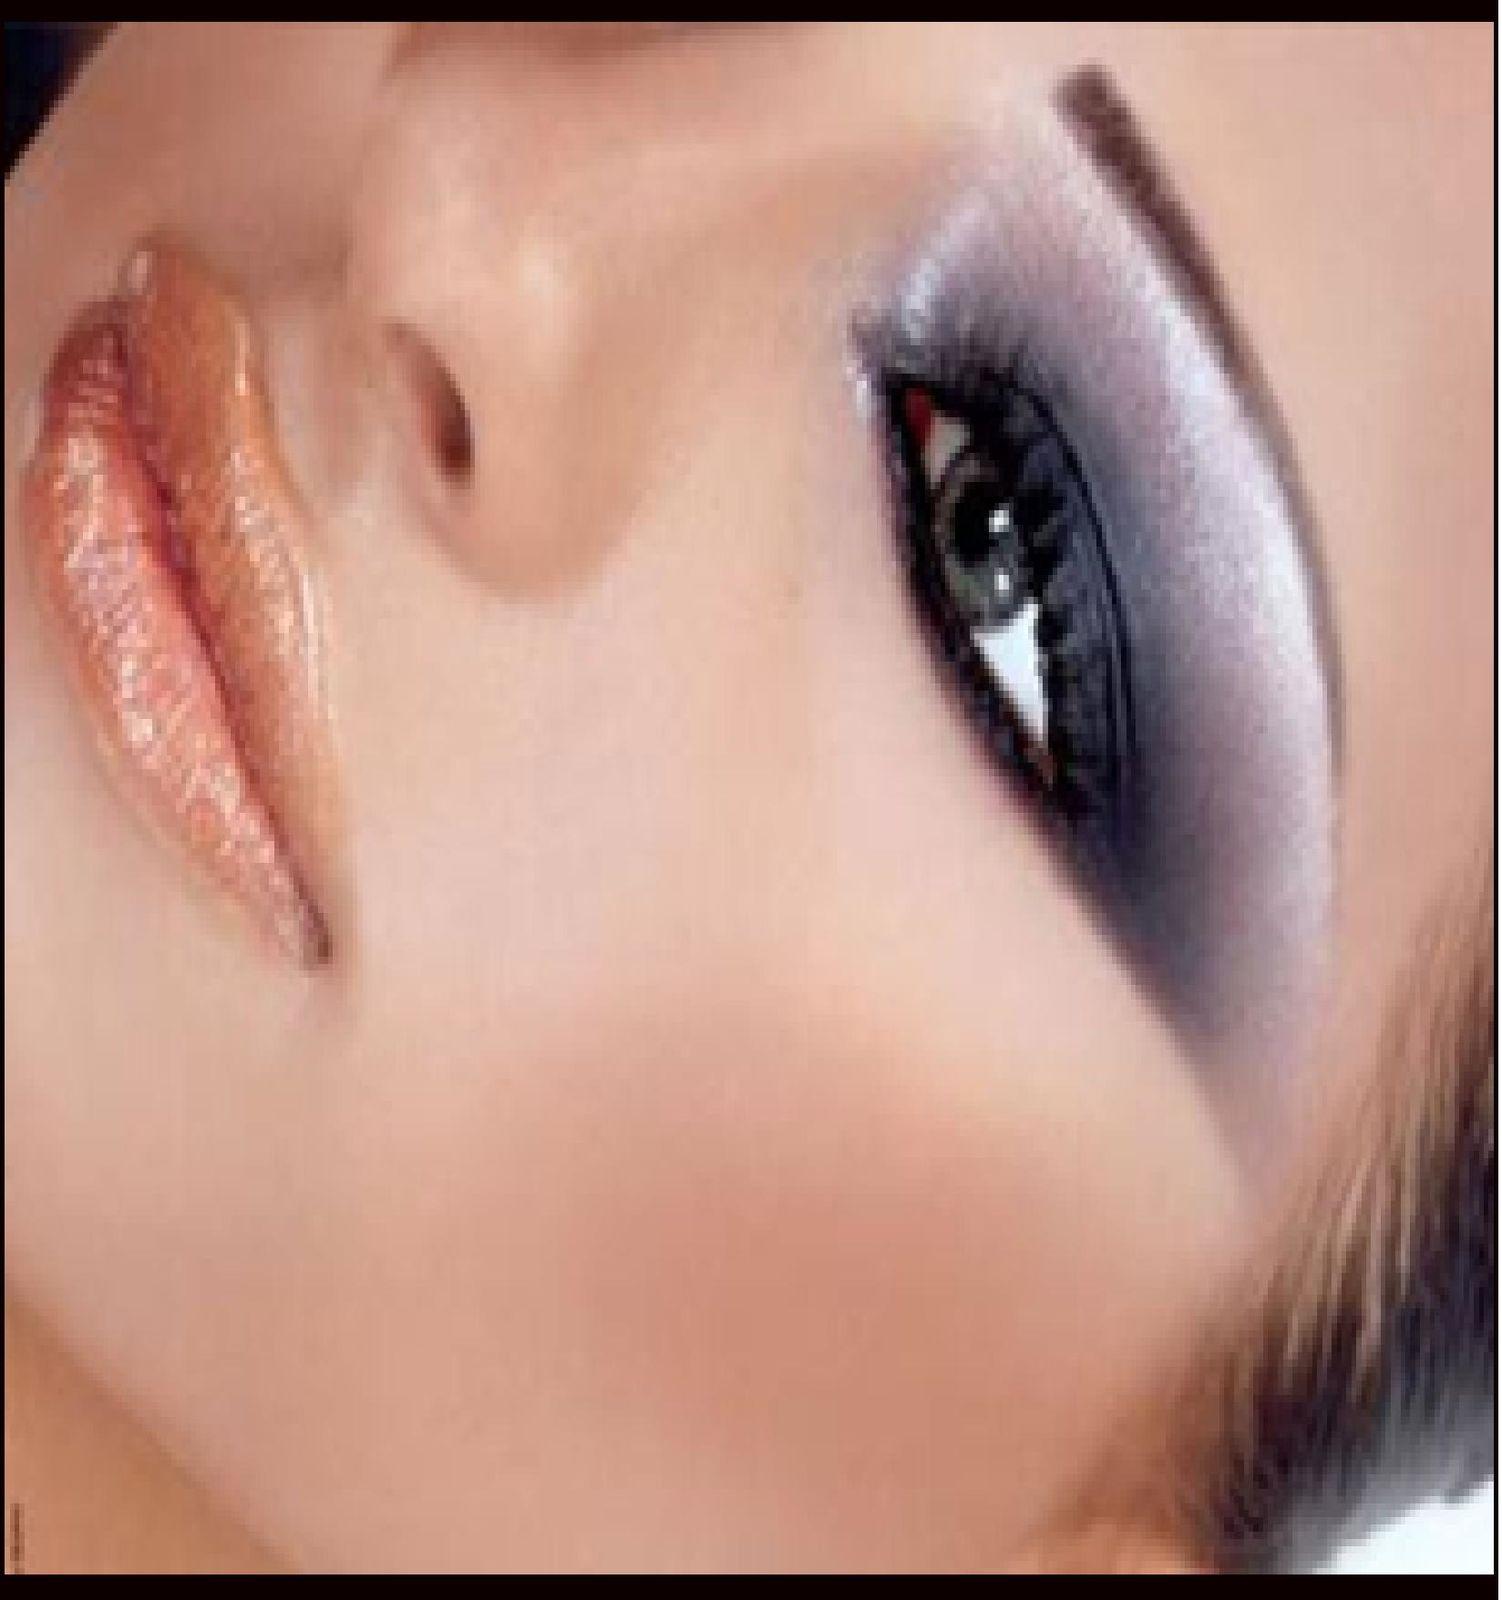 Notre maquillage en vidéos